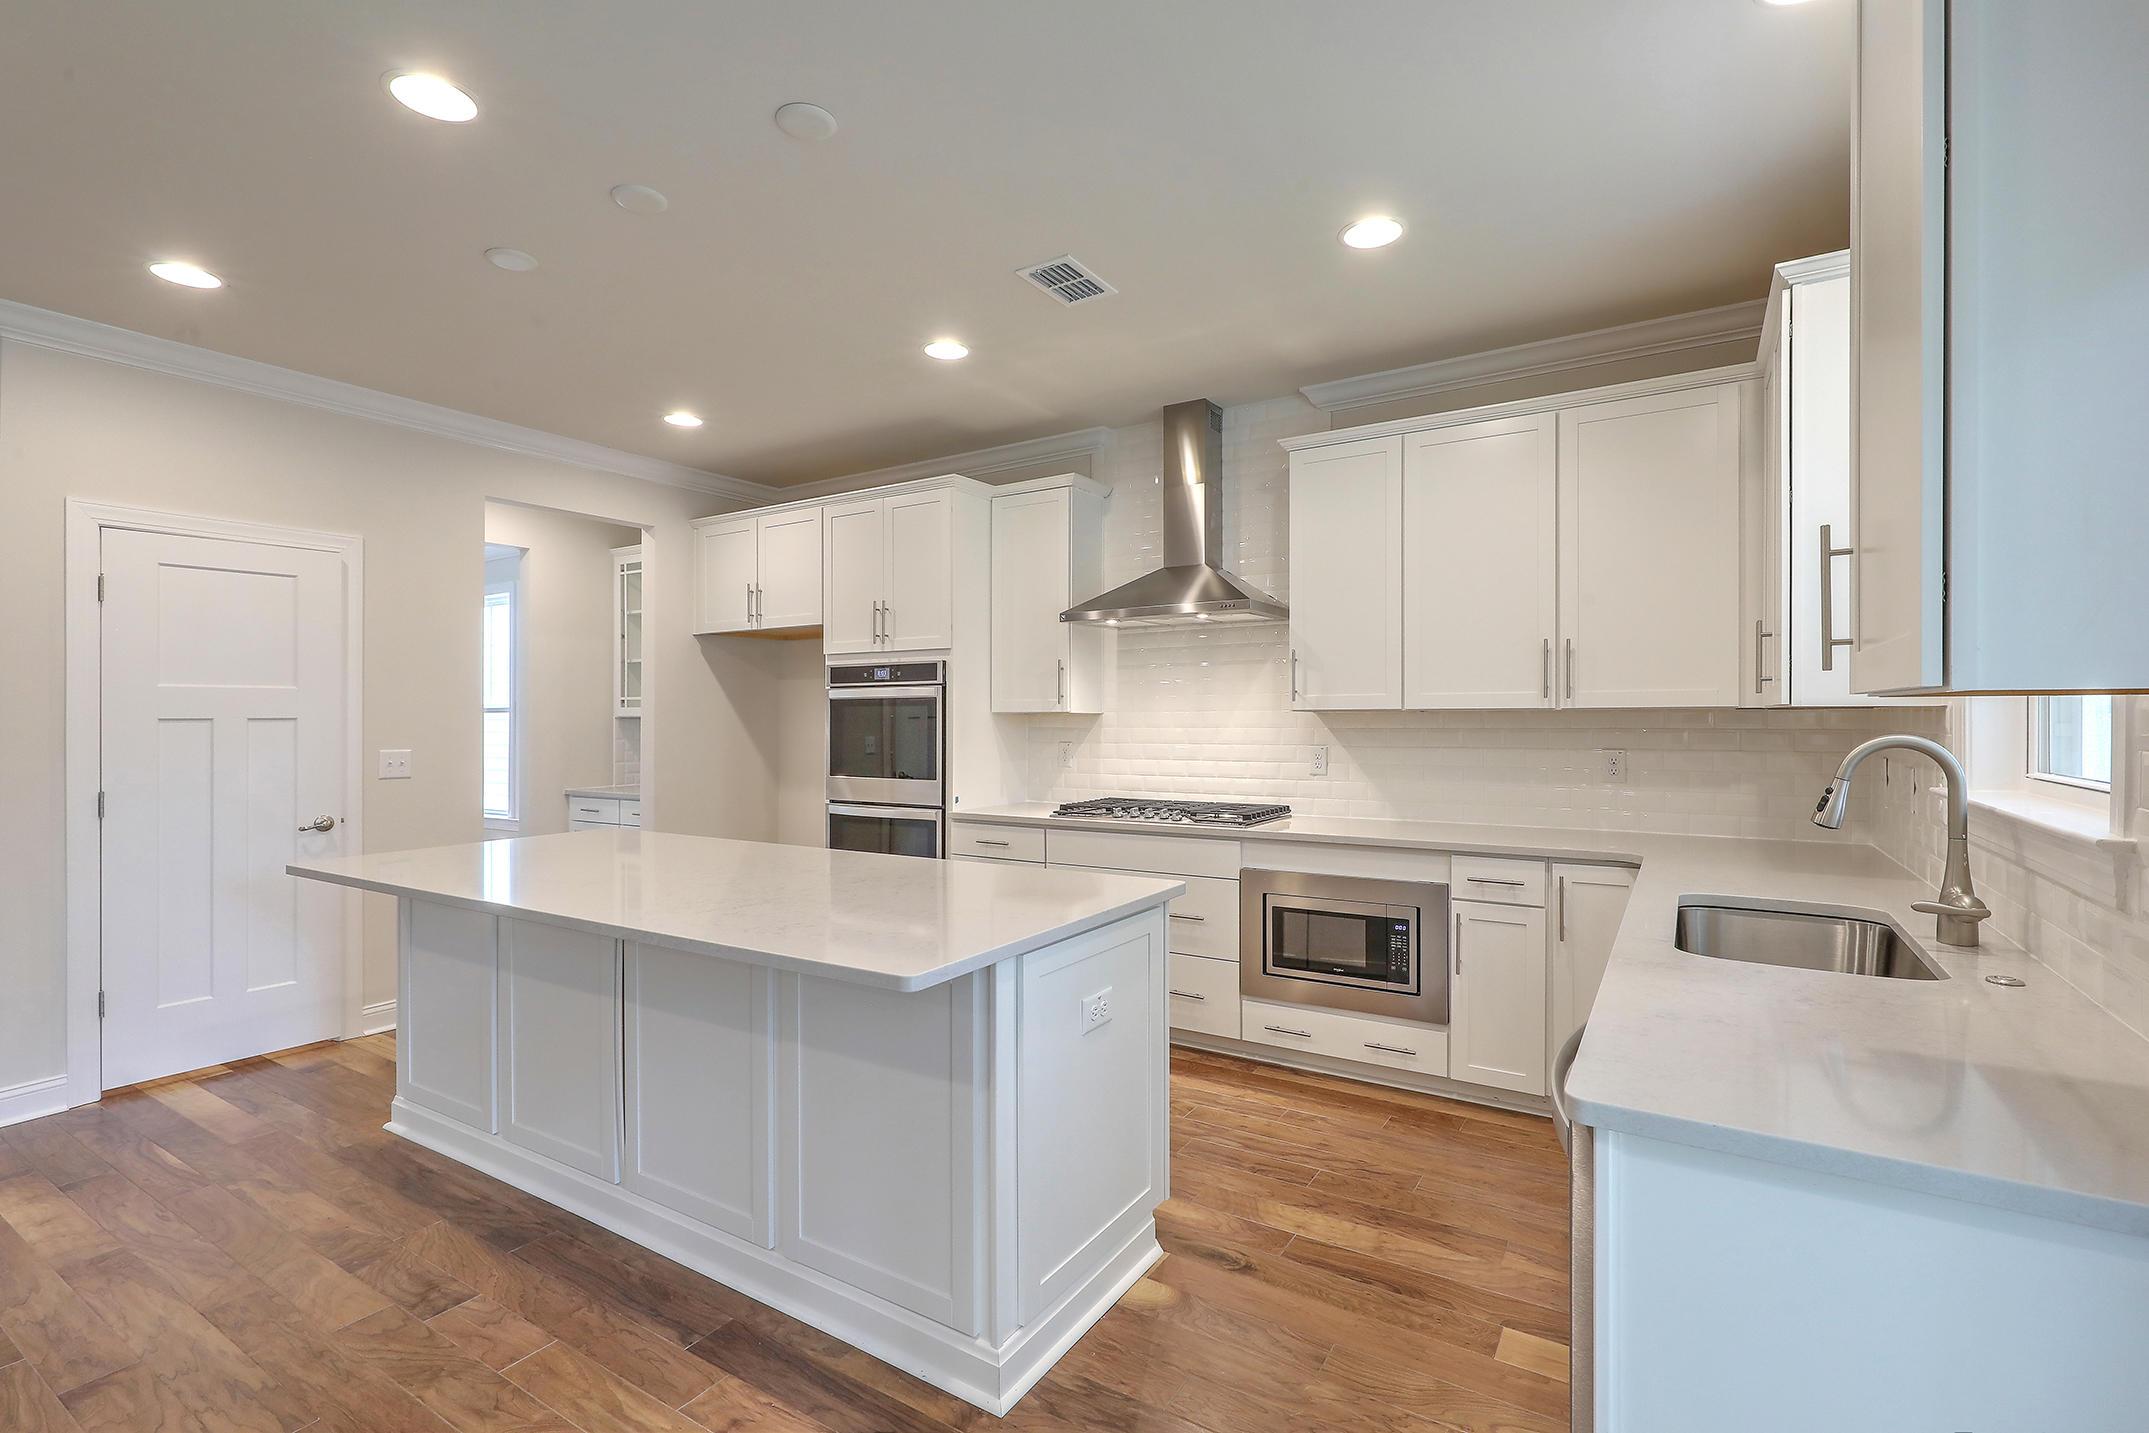 Bentley Park Homes For Sale - 1277 Gannett, Mount Pleasant, SC - 21